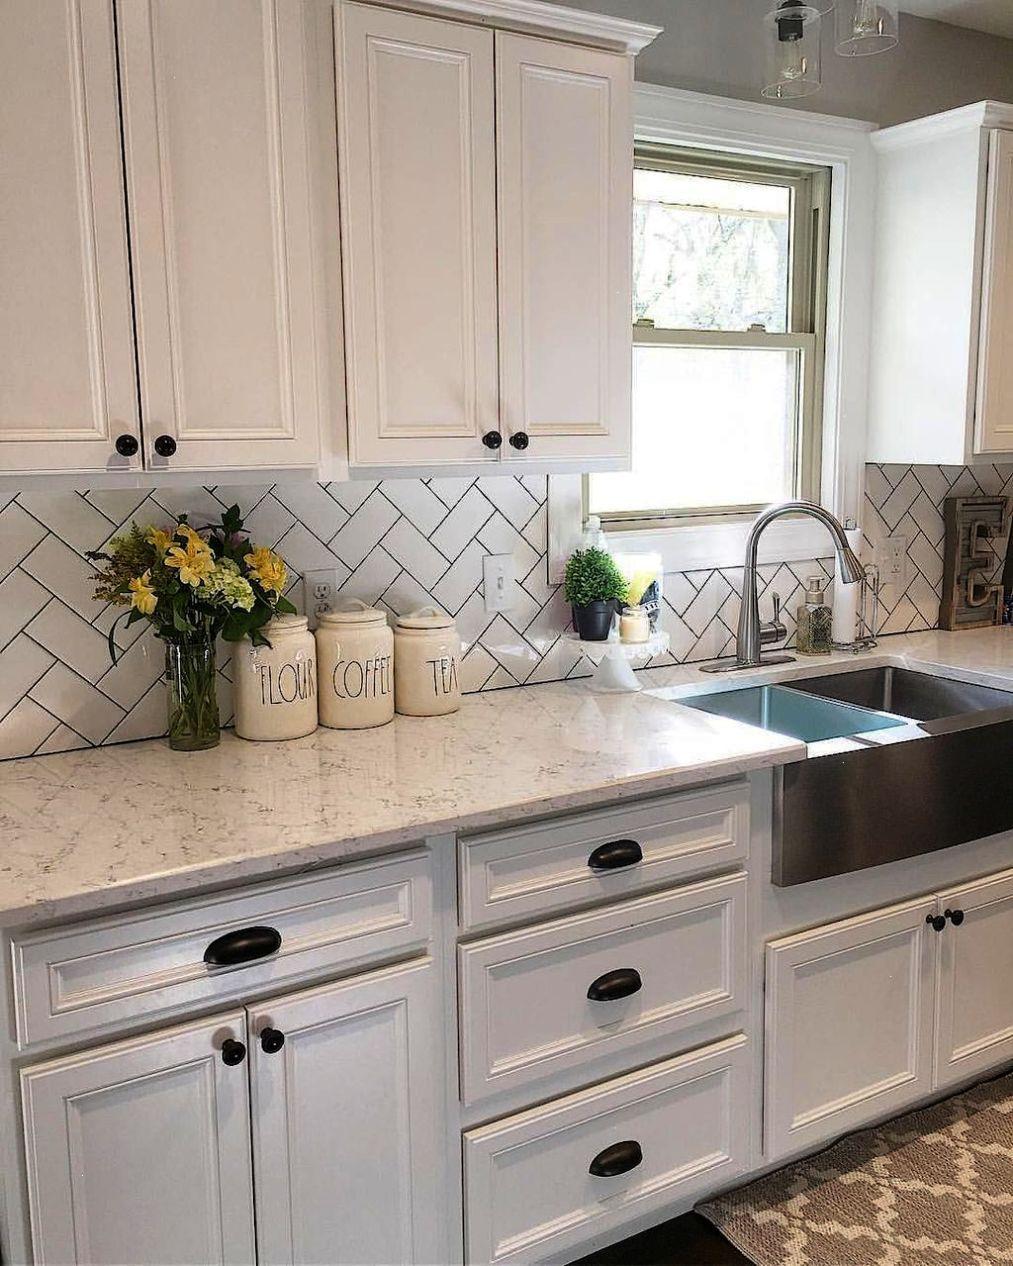 Best 100 White Kitchen Cabinets Decor Ideas For Farmhouse Style Design 67 Kitchen Cabinets Decor Kitchen Cabinet Design Kitchen Backsplash Designs